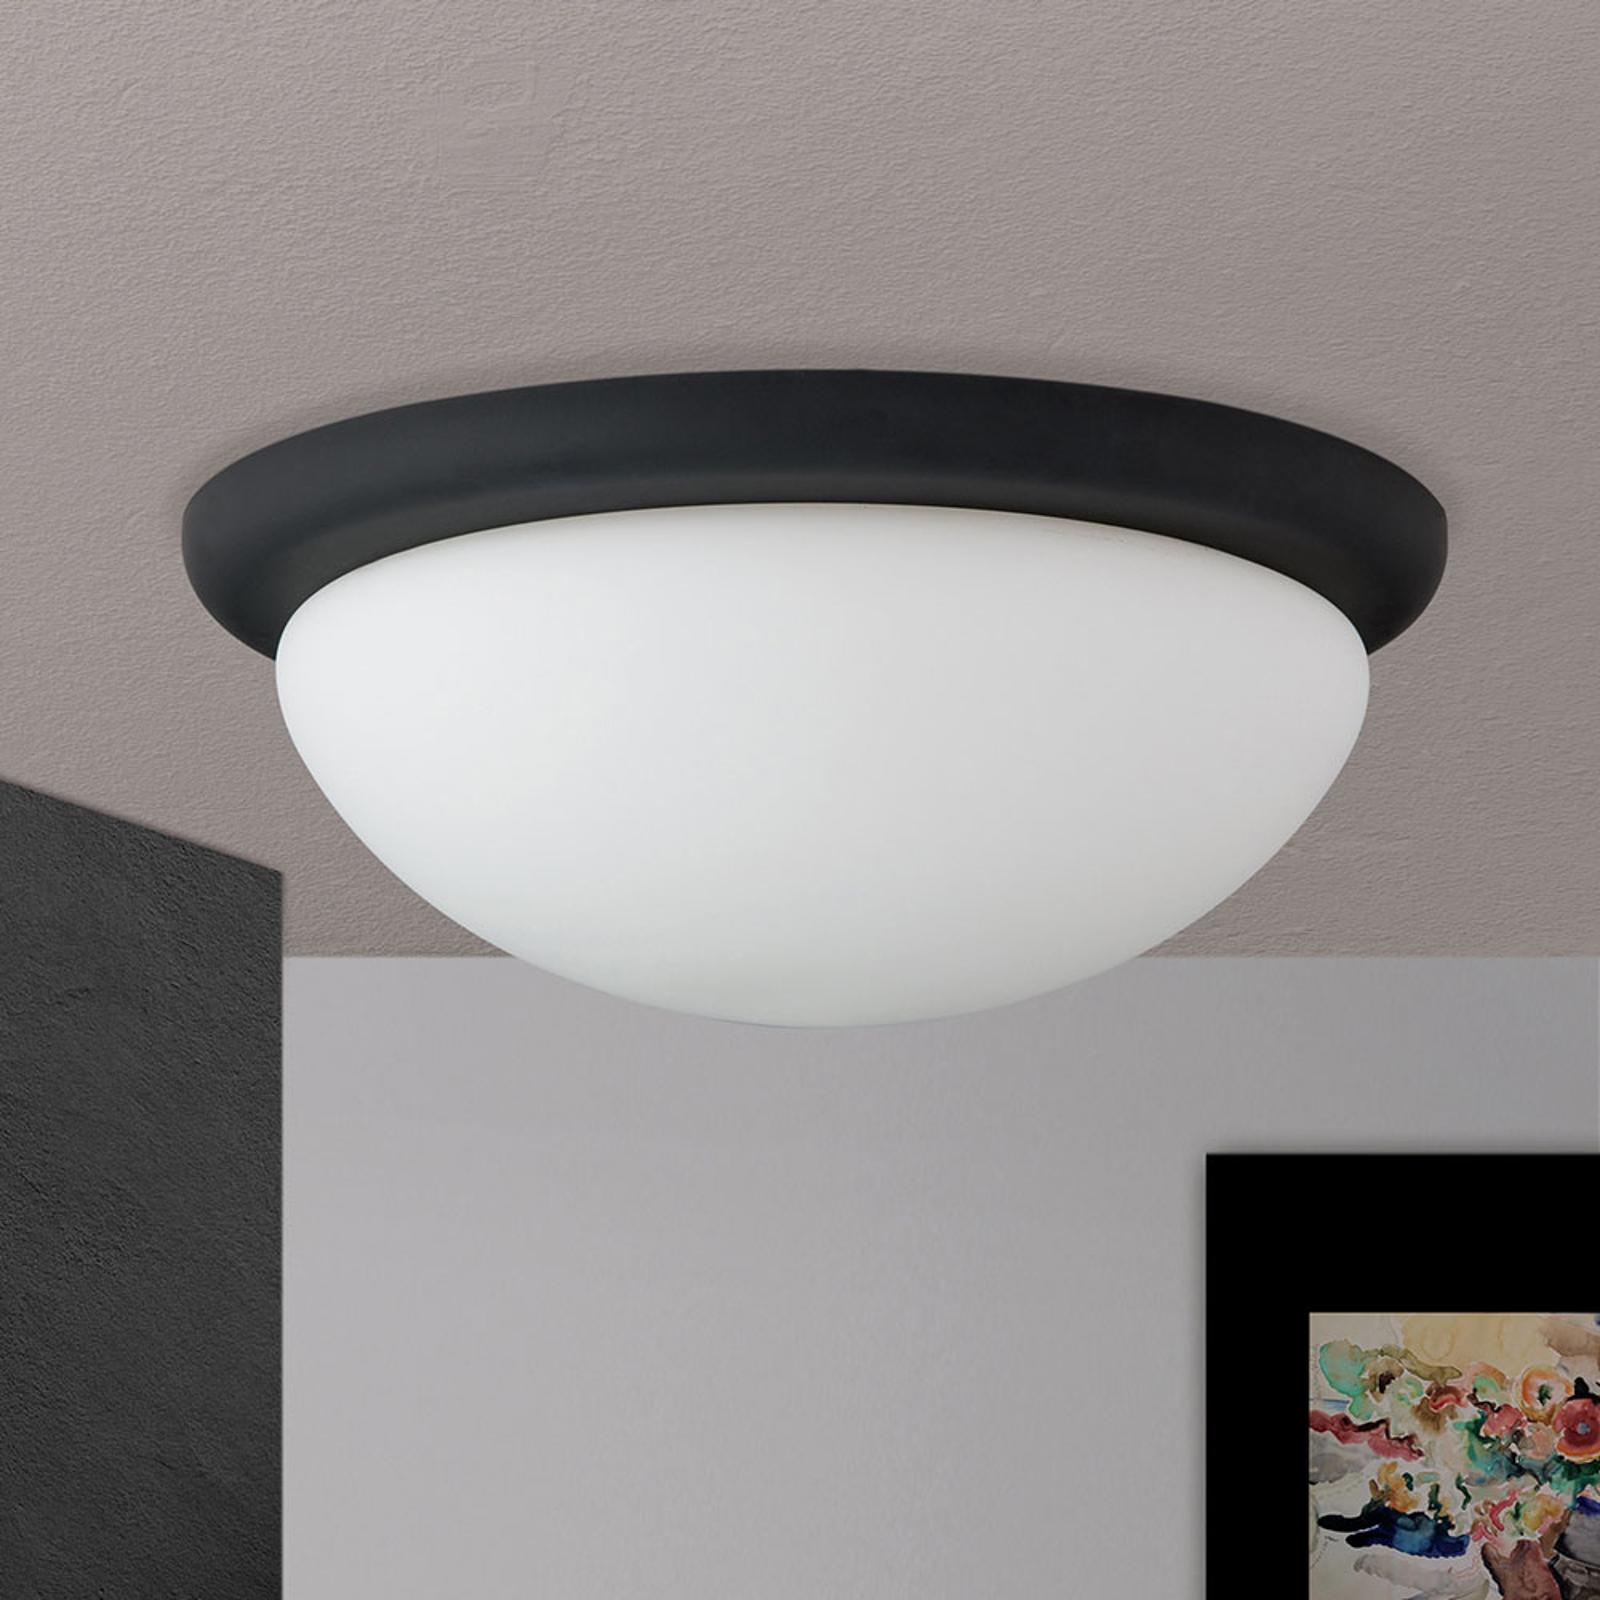 Plafondlamp Classico, zwart/wit, Ø 38 cm